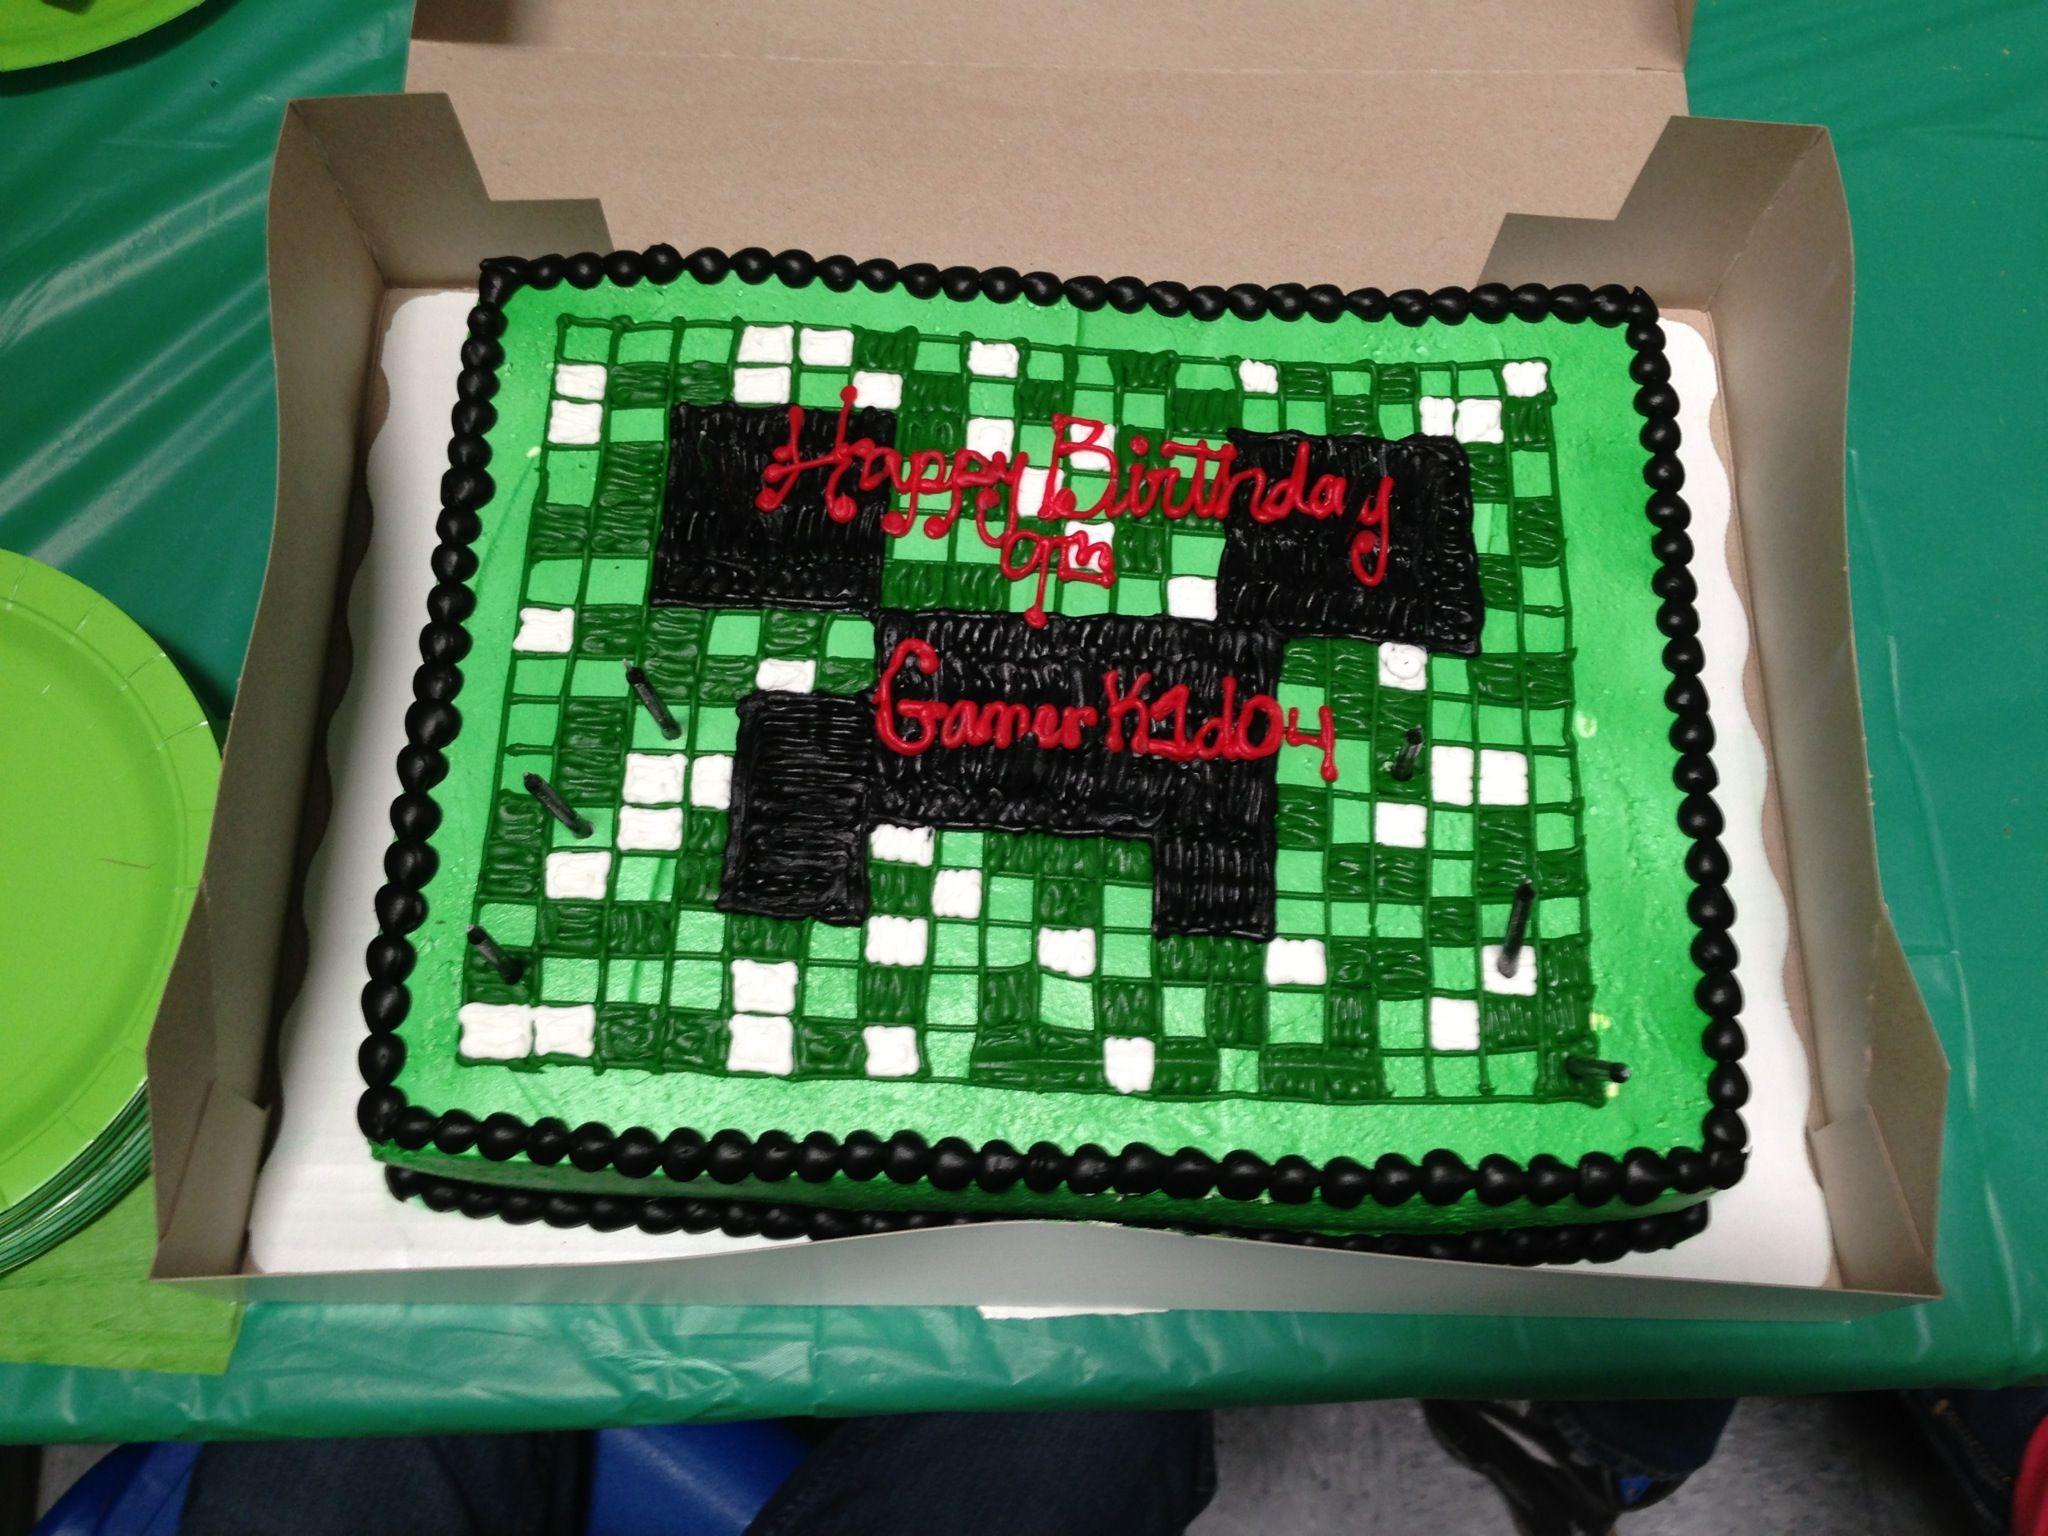 Ts Minecraft birthday cake Got it made at Walmart a little